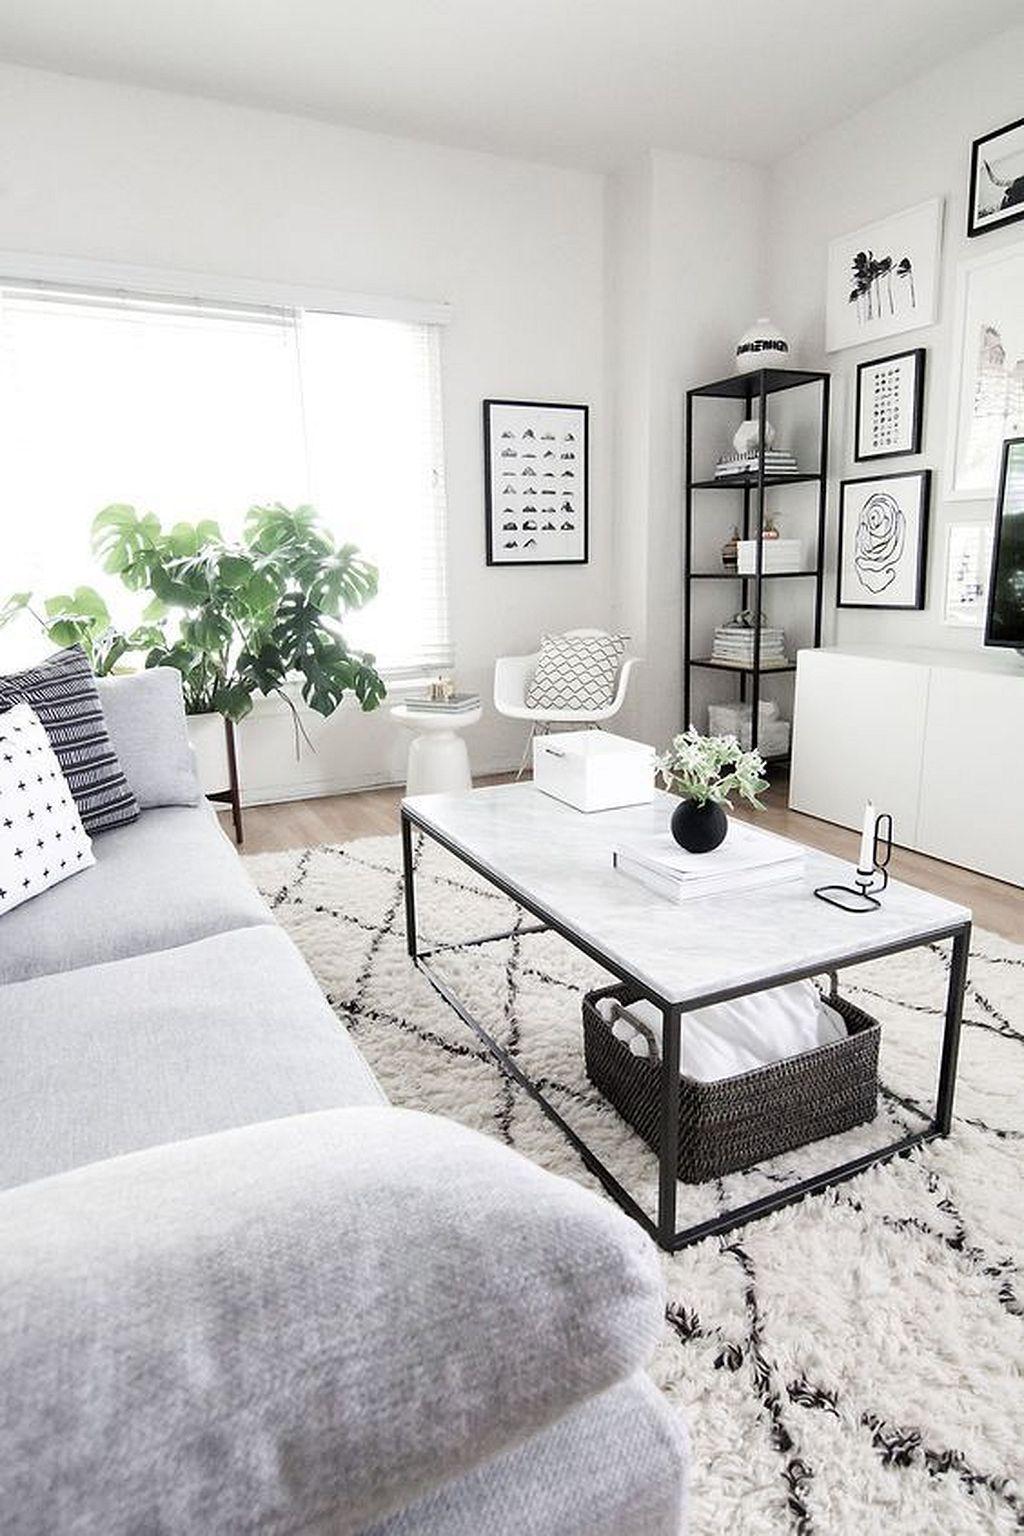 Minimalist Home Facade Building minimalist decor wall interior design. Epic 22  Best Apartment ...